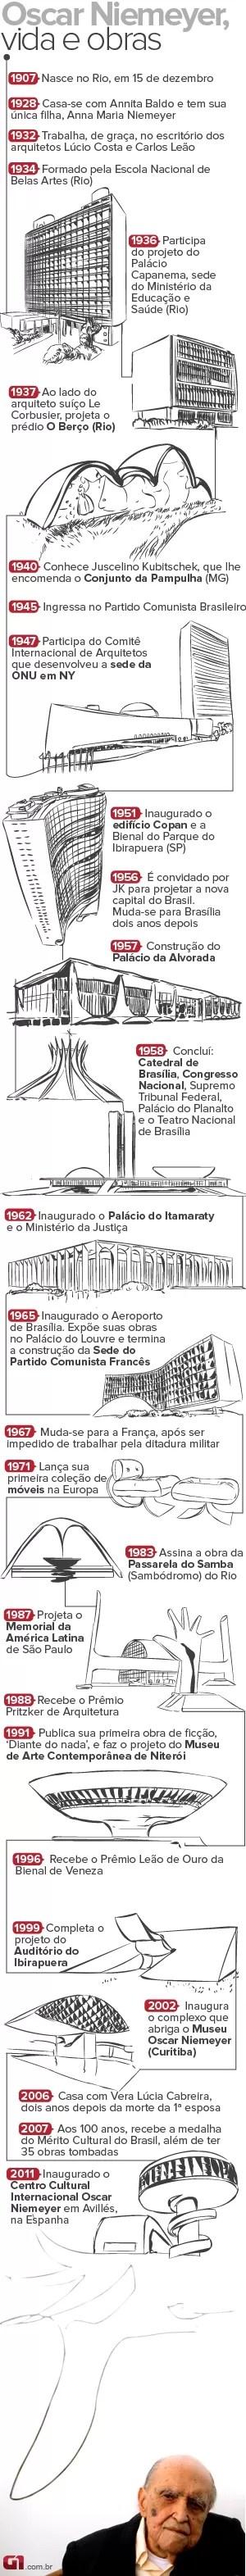 VALE ESTE Vida e Obras de Niemeyer (Foto: Arte/G1)